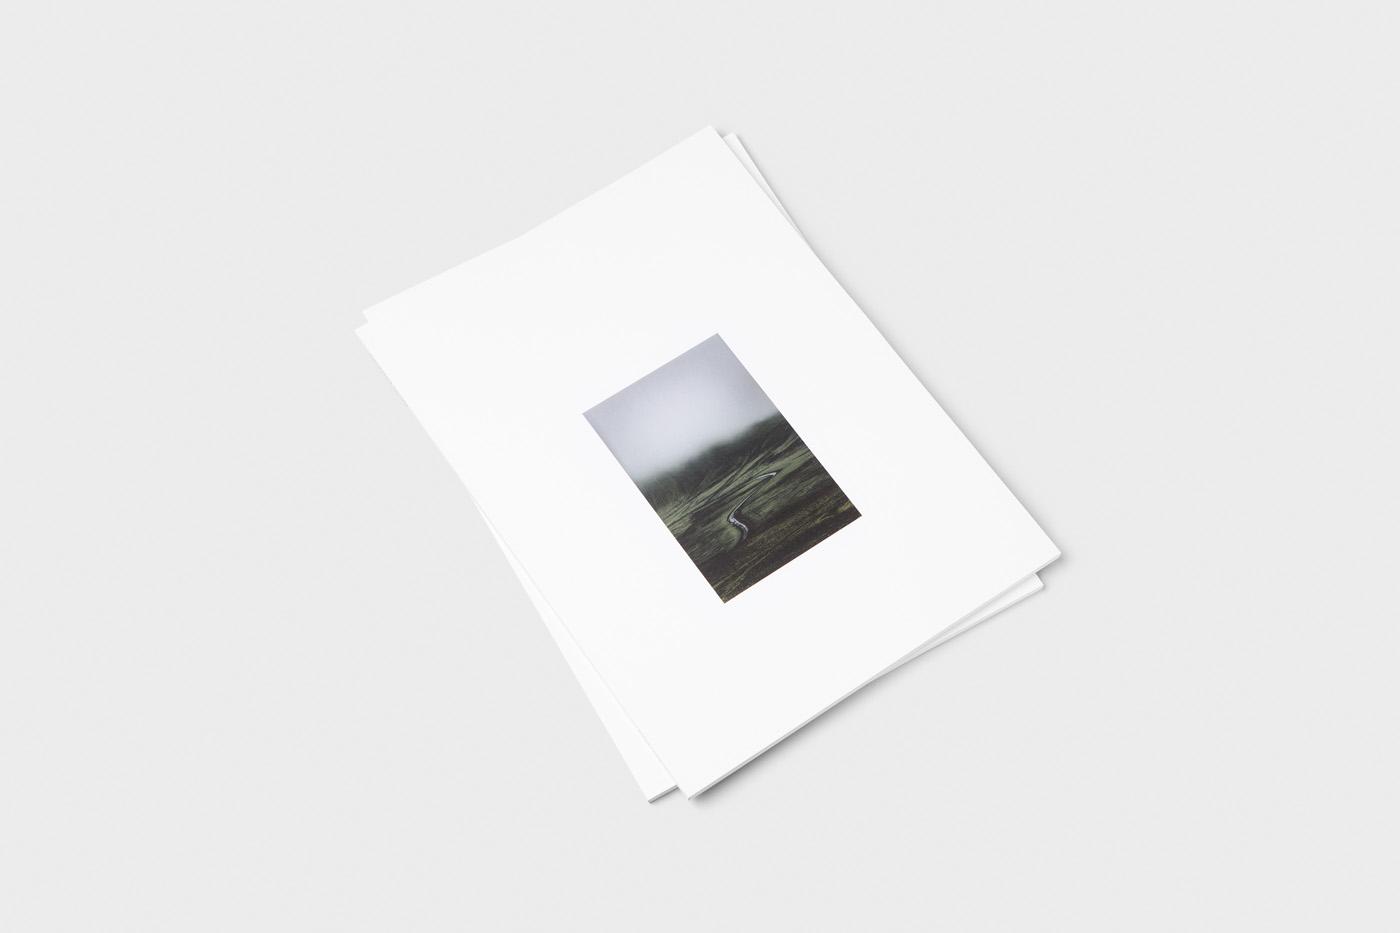 Honorarium photography book for Shantanu Starick 5